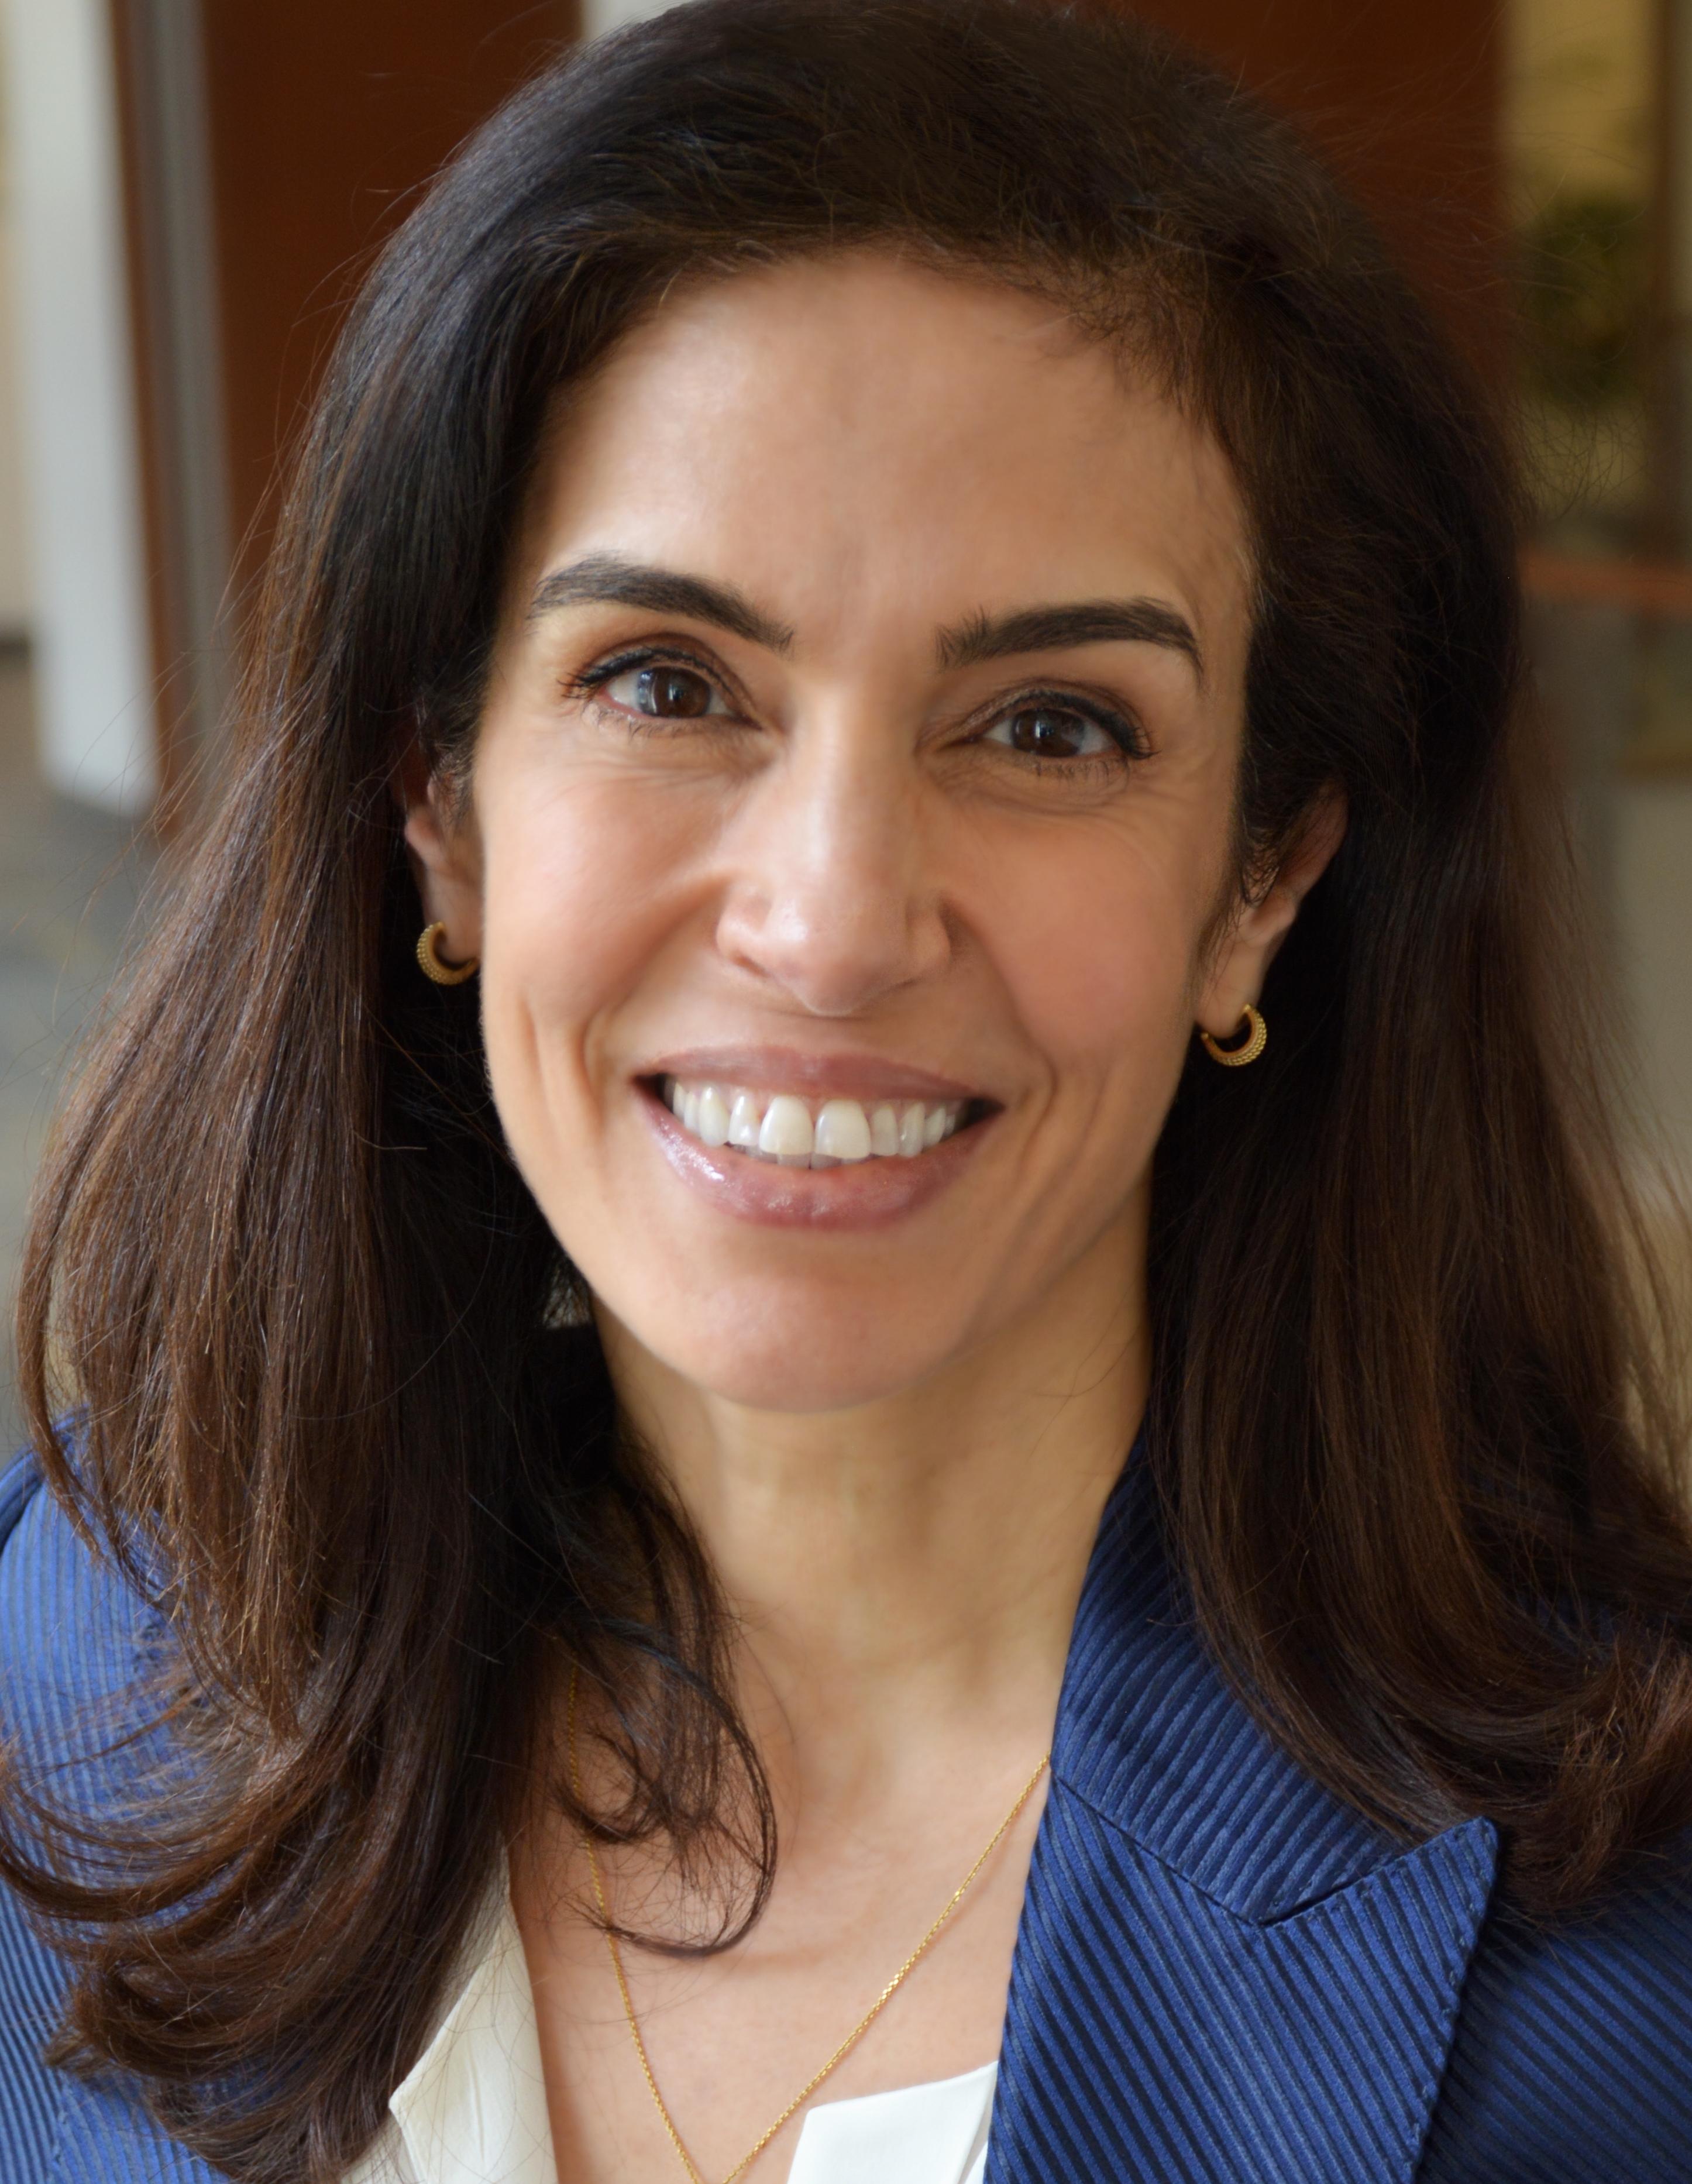 Communication on this topic: Lisa Regina, sian-clifford/